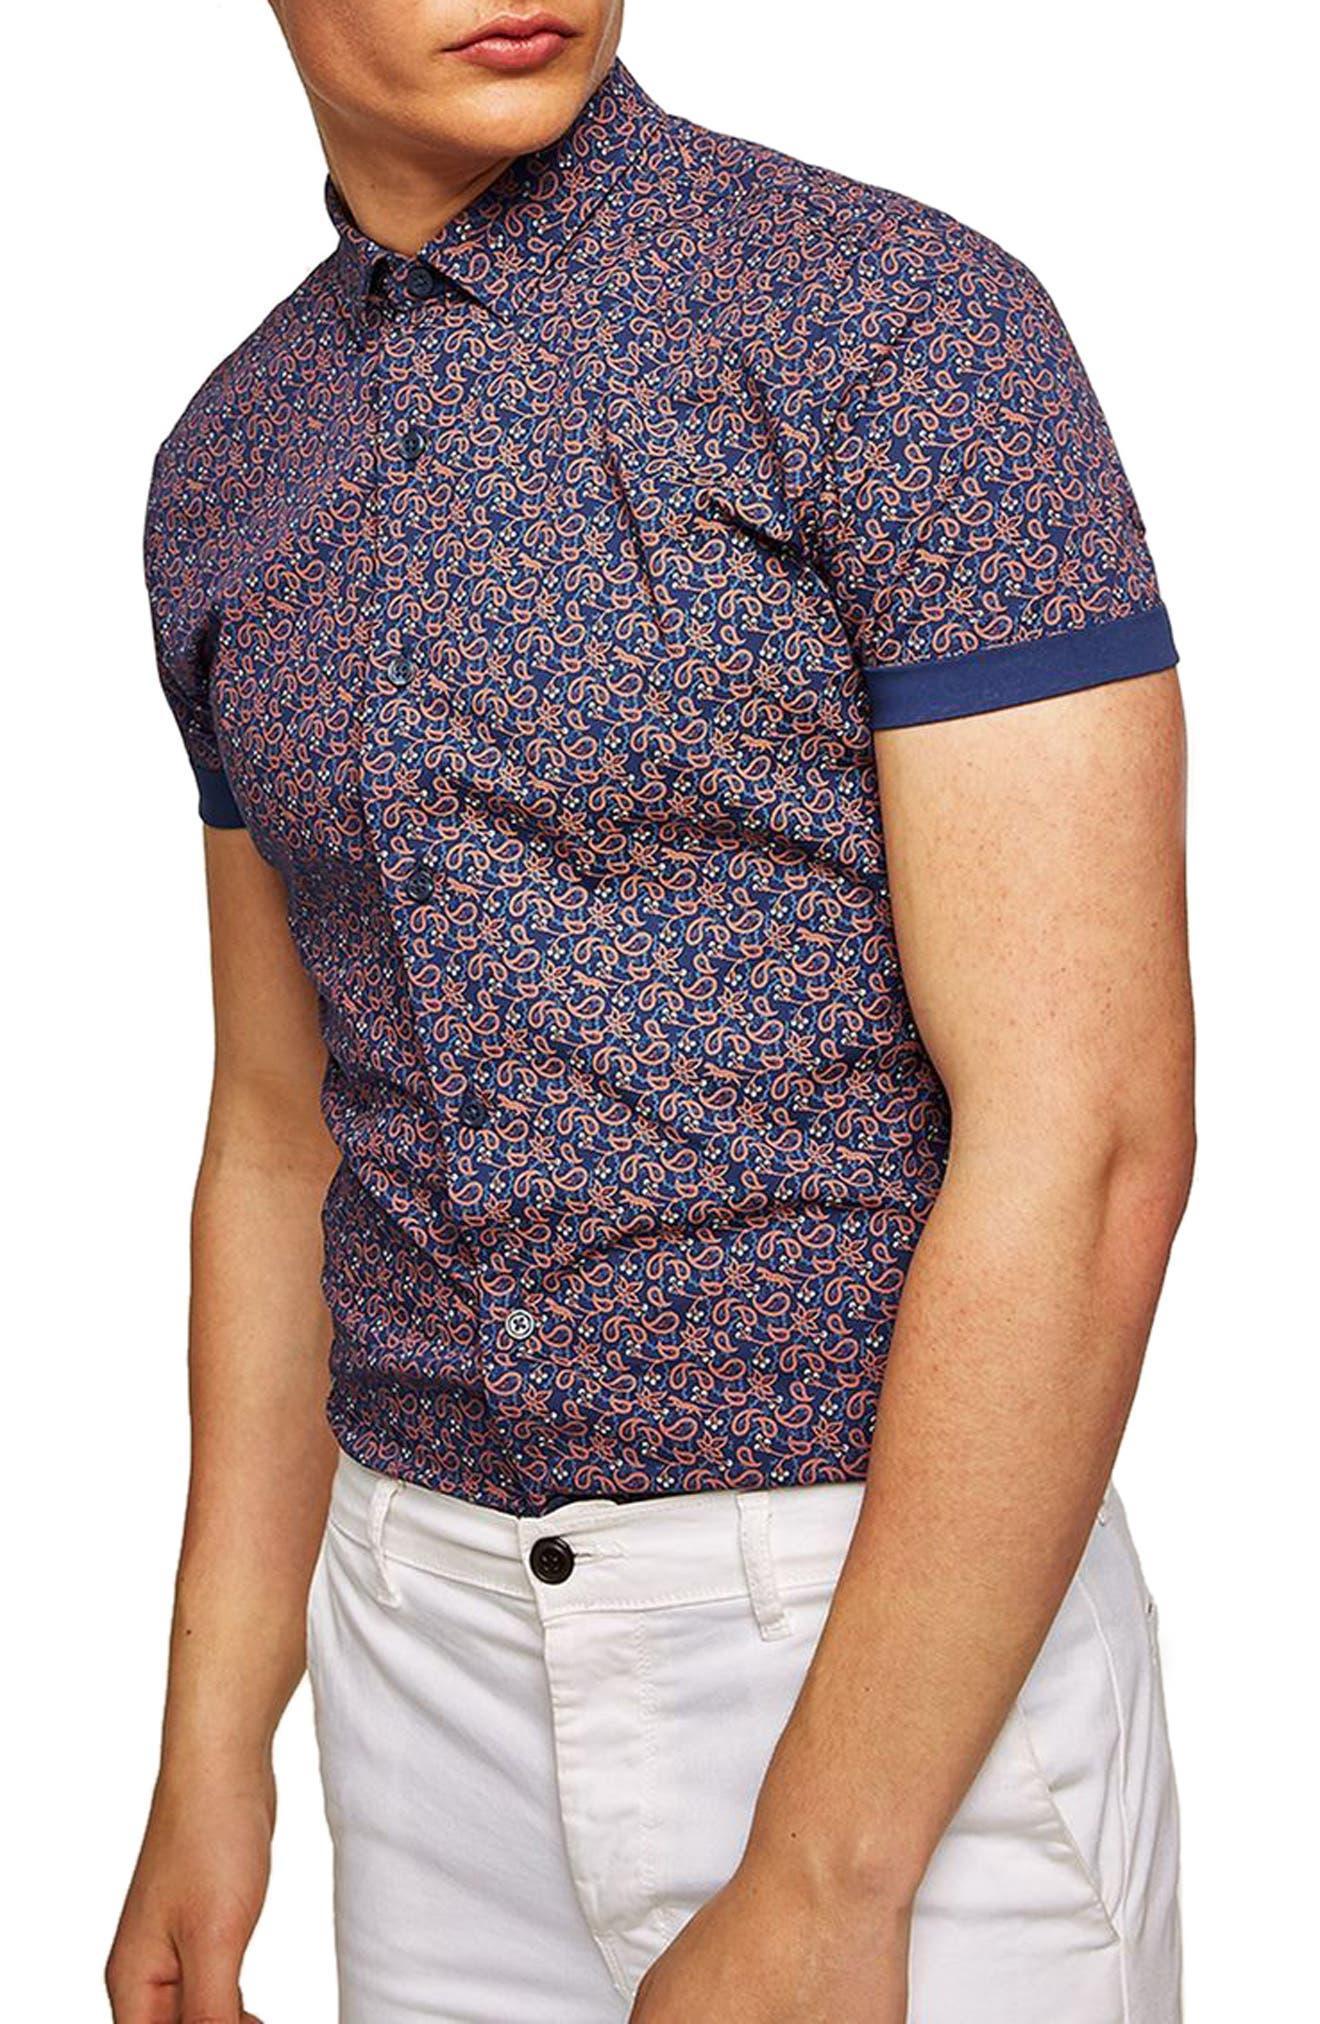 TOPMAN,                             Muscle Fit Eclectic Paisley Print Shirt,                             Main thumbnail 1, color,                             400